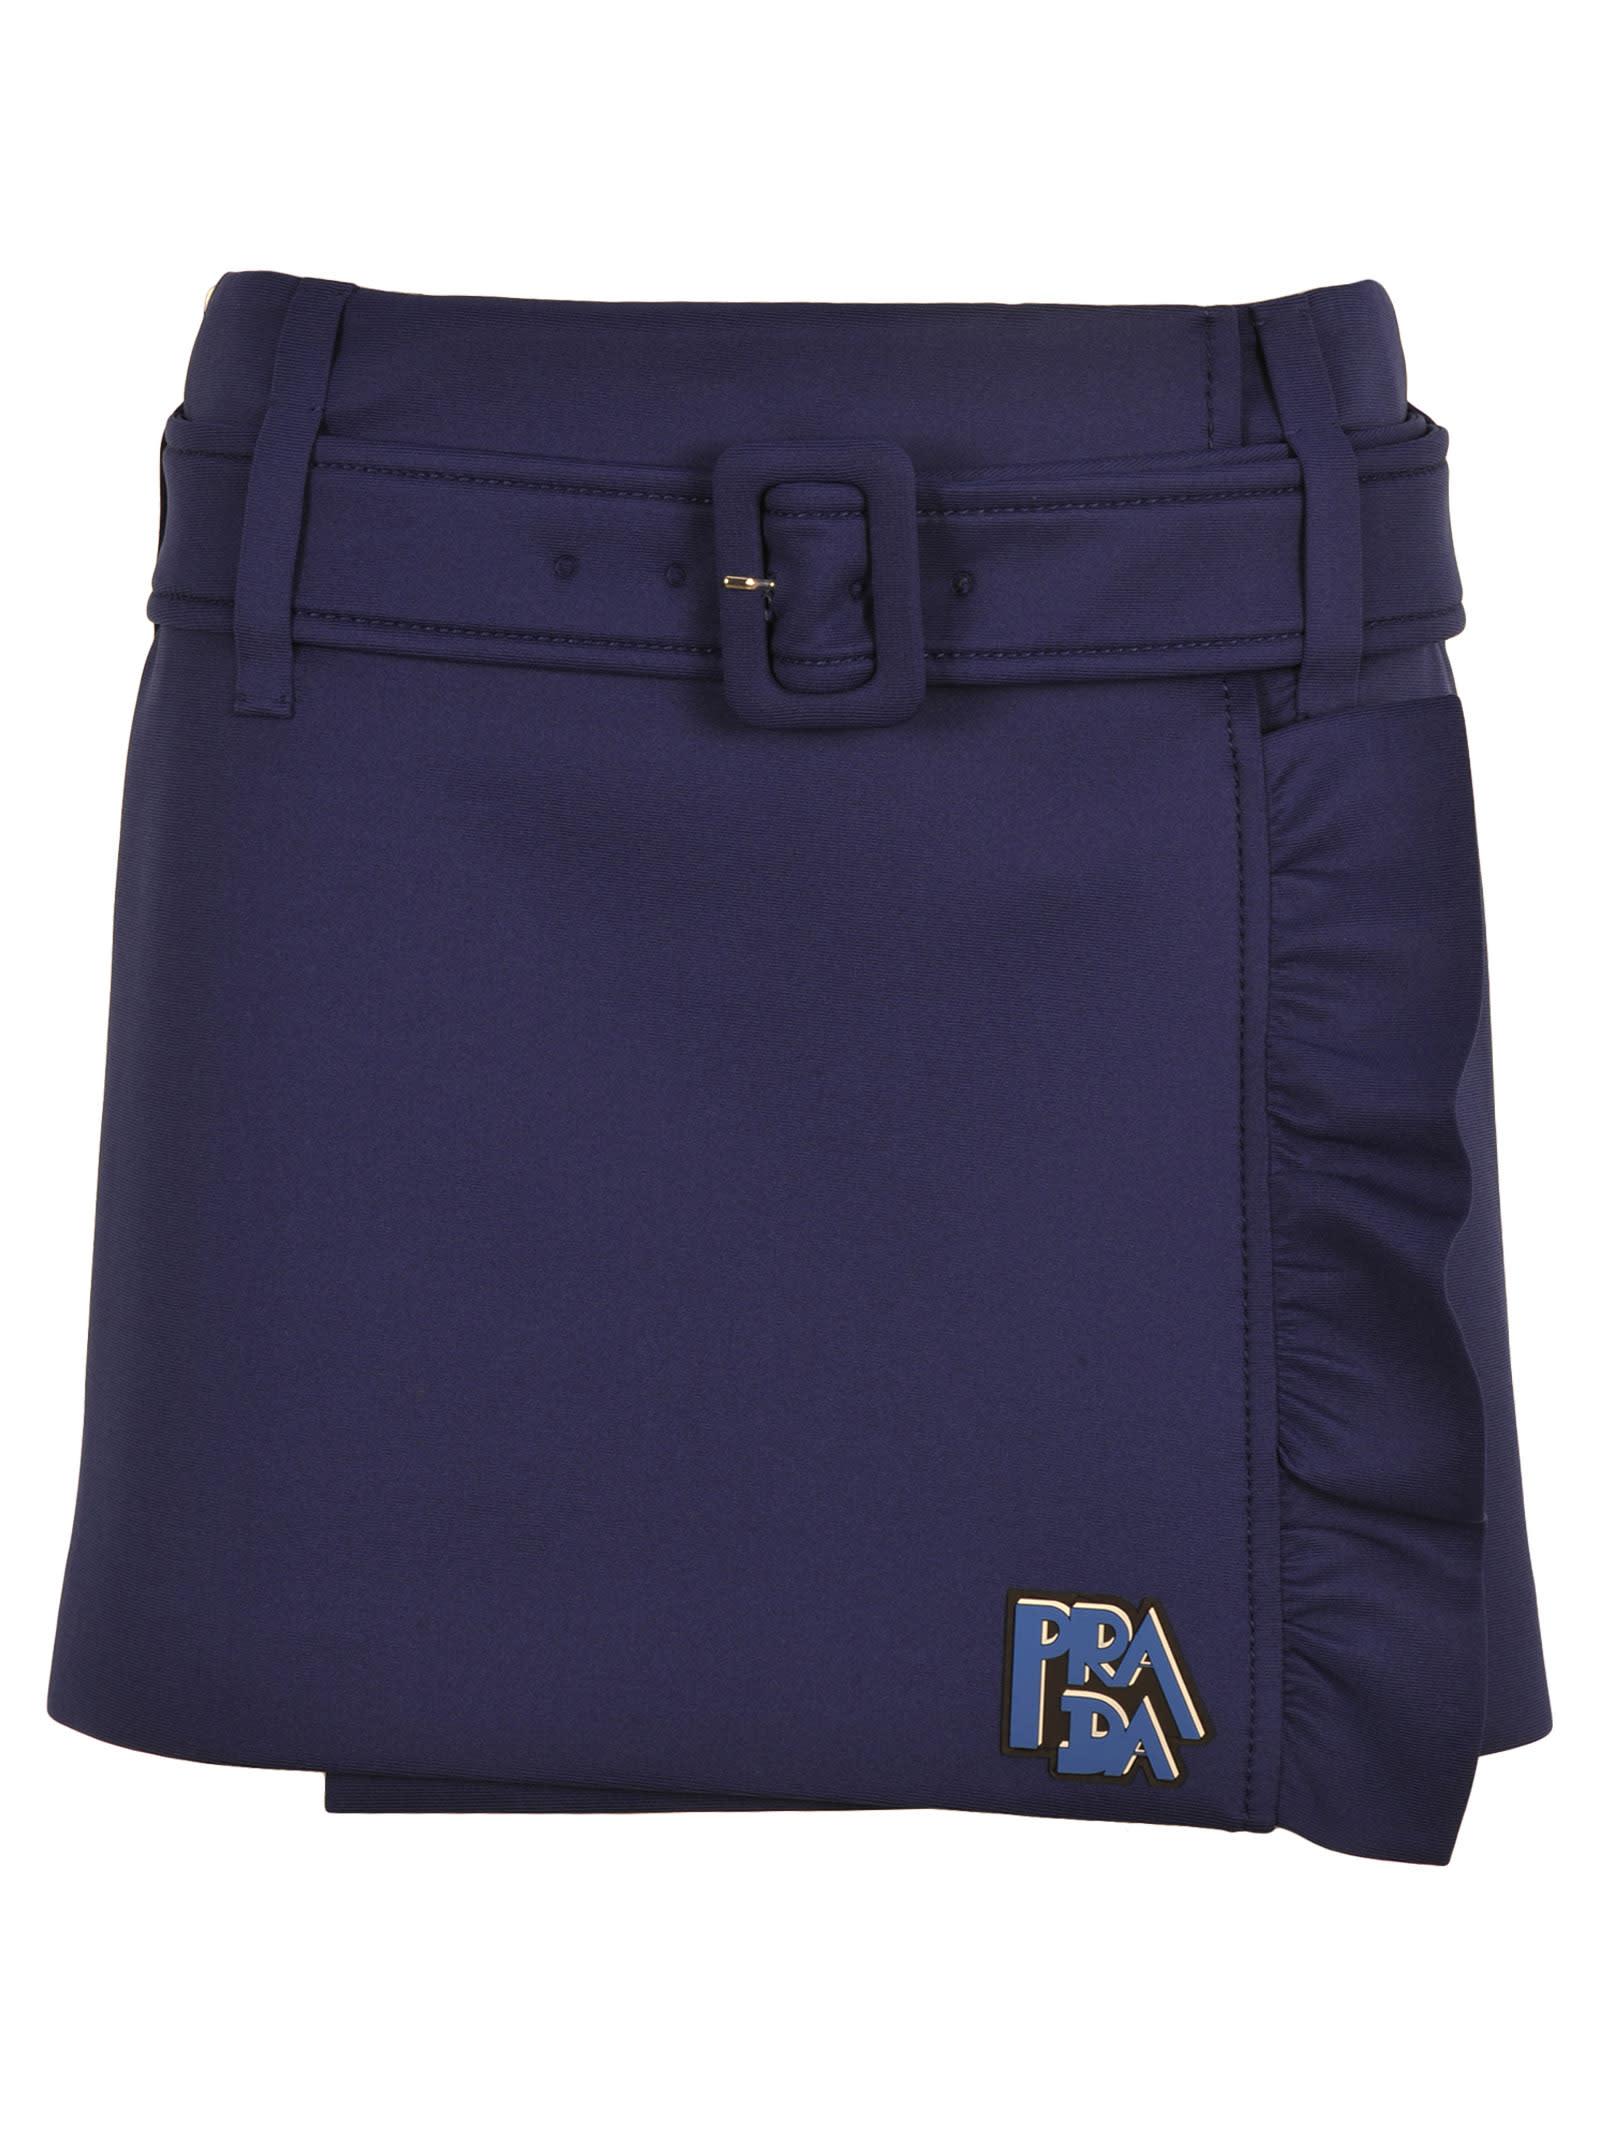 01baa68f68389 Prada Prada Envelope Ruffled Mini Skirt